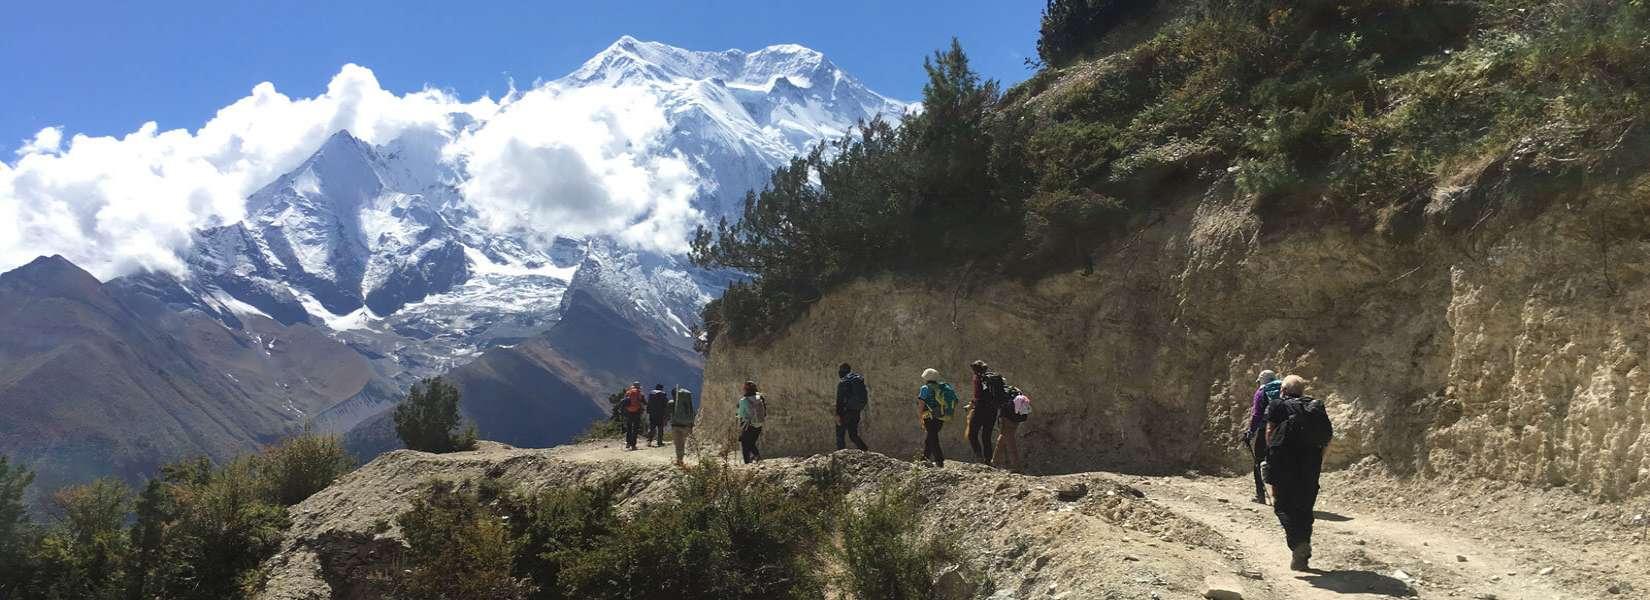 Trekkers doing the great Annapurna Circuit Trek